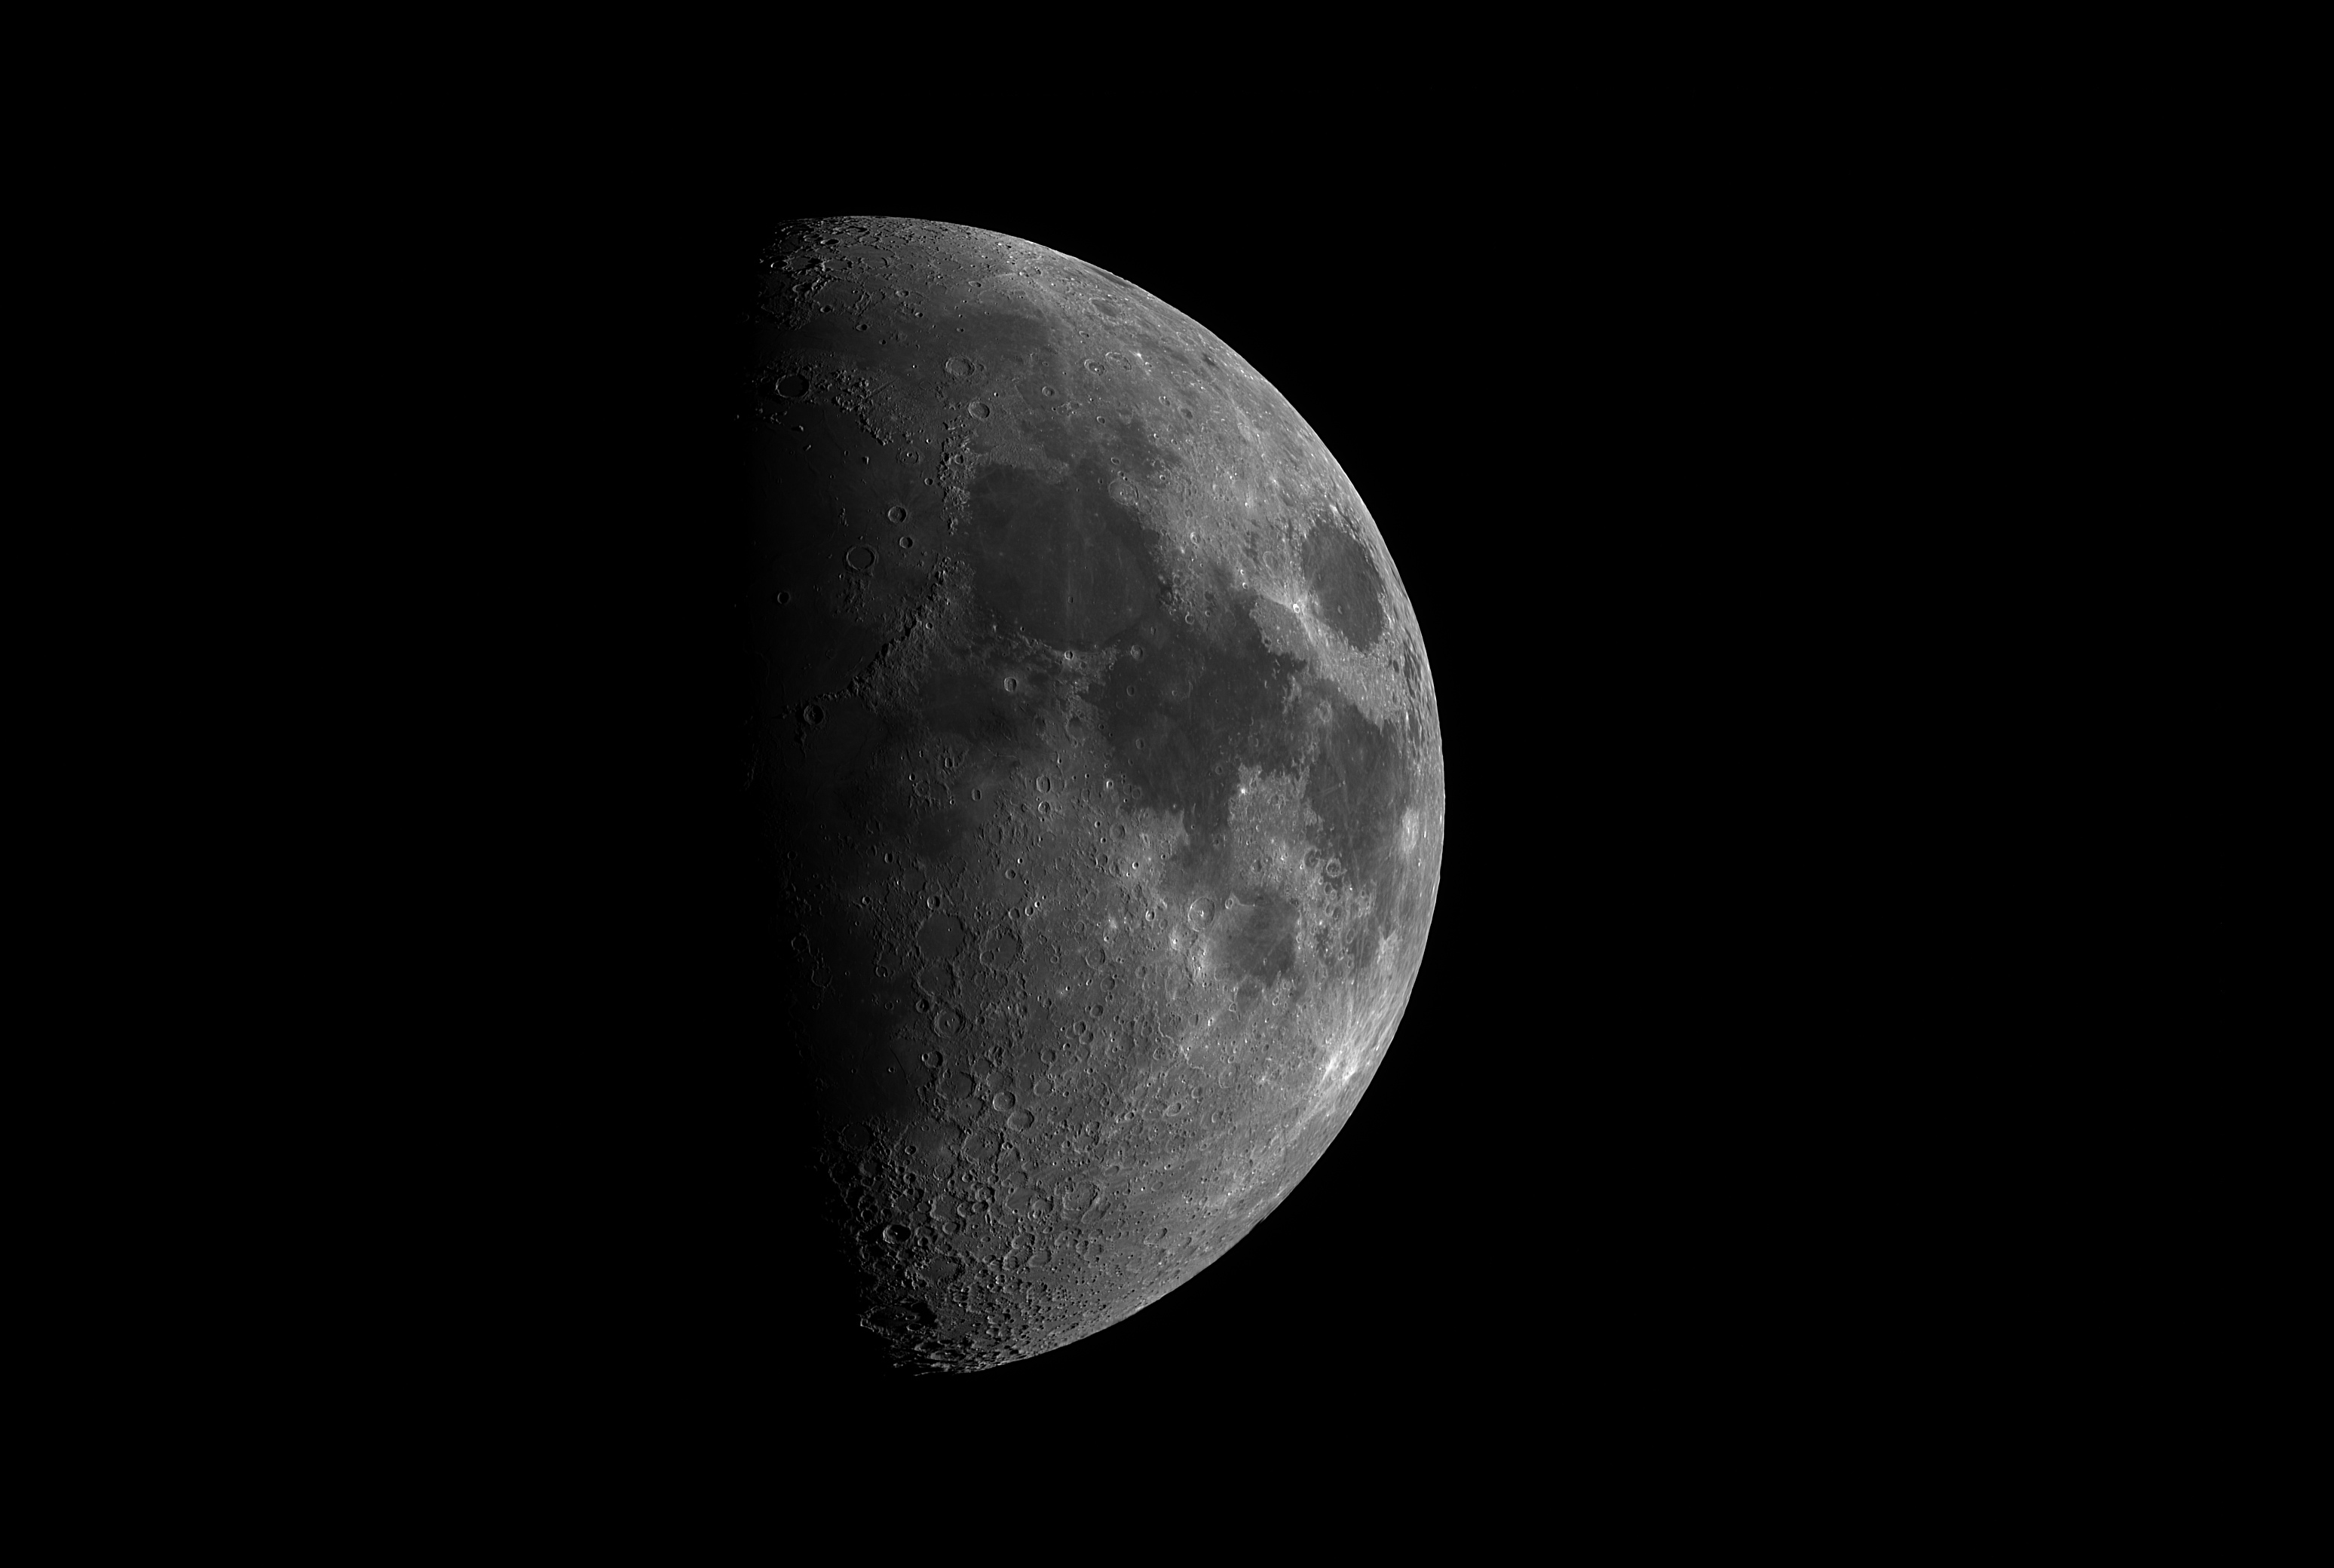 2019-02-13-Lune lulu 66/388 asi 178MM.jpg